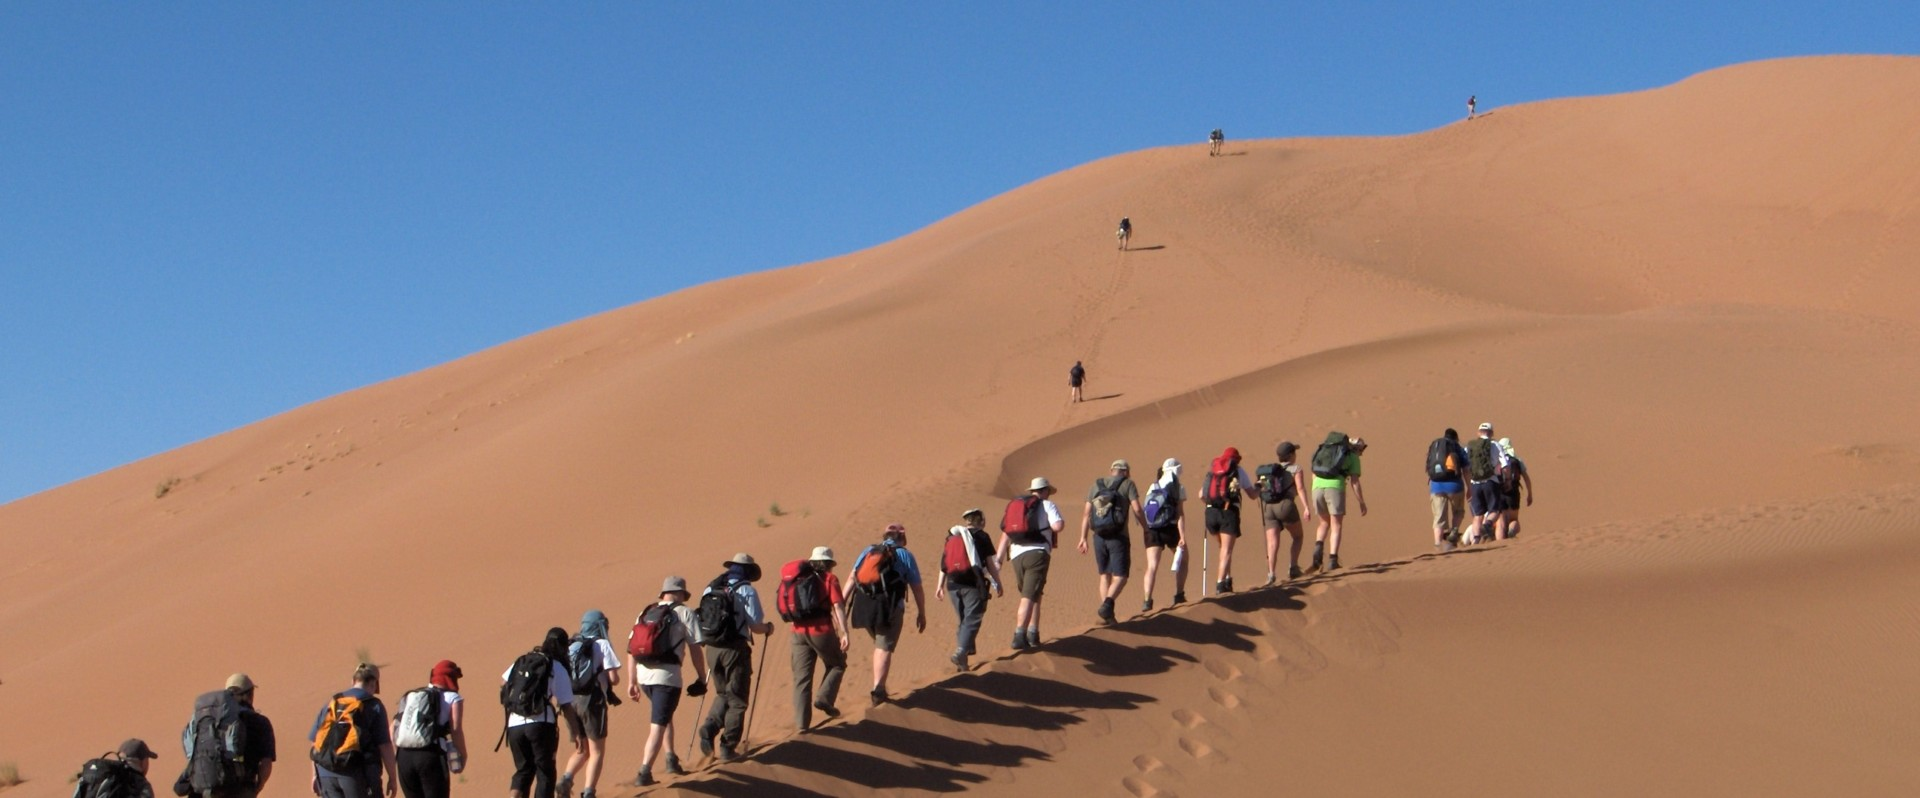 People trekking across the Sahara Desert